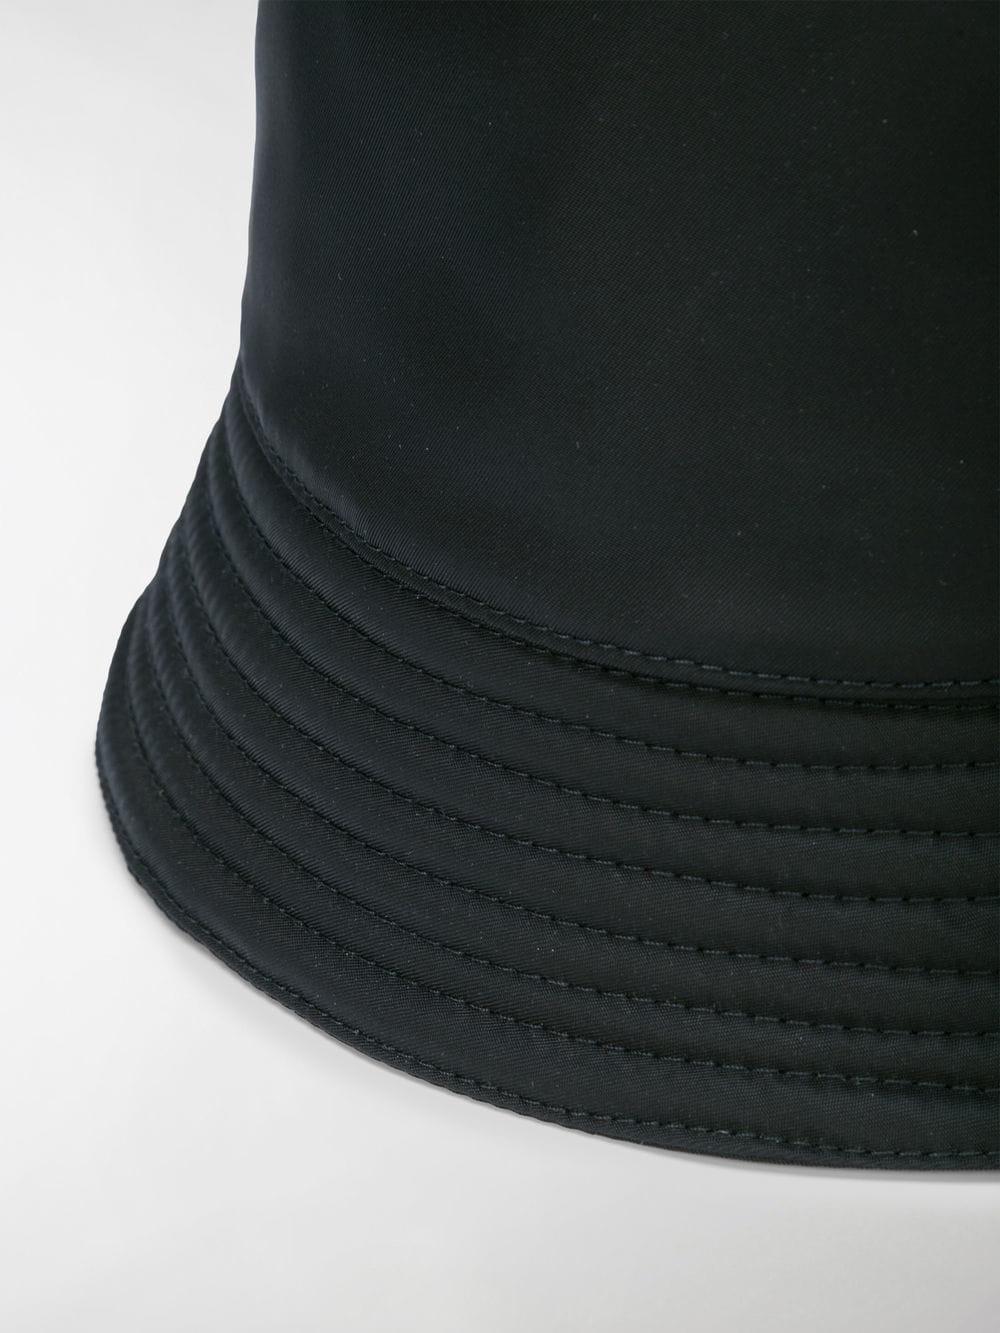 391820f7cf0 Prada - Black Technical Fabric Cap for Men - Lyst. View fullscreen